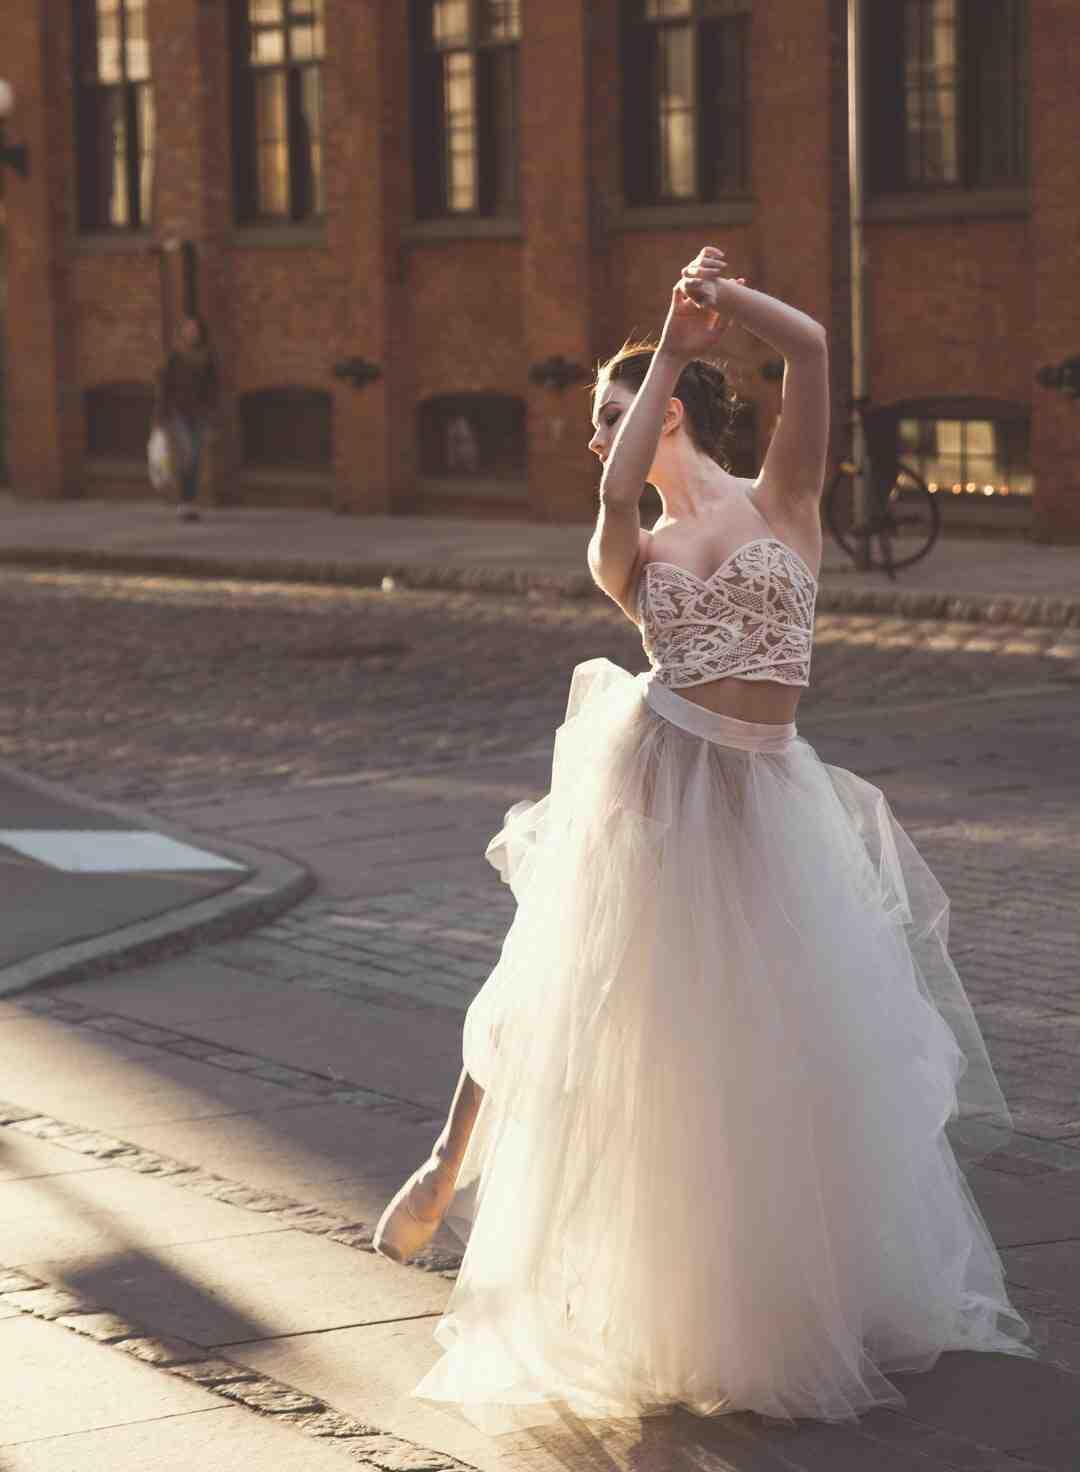 Danse : Bamba Comment apprendre à danser